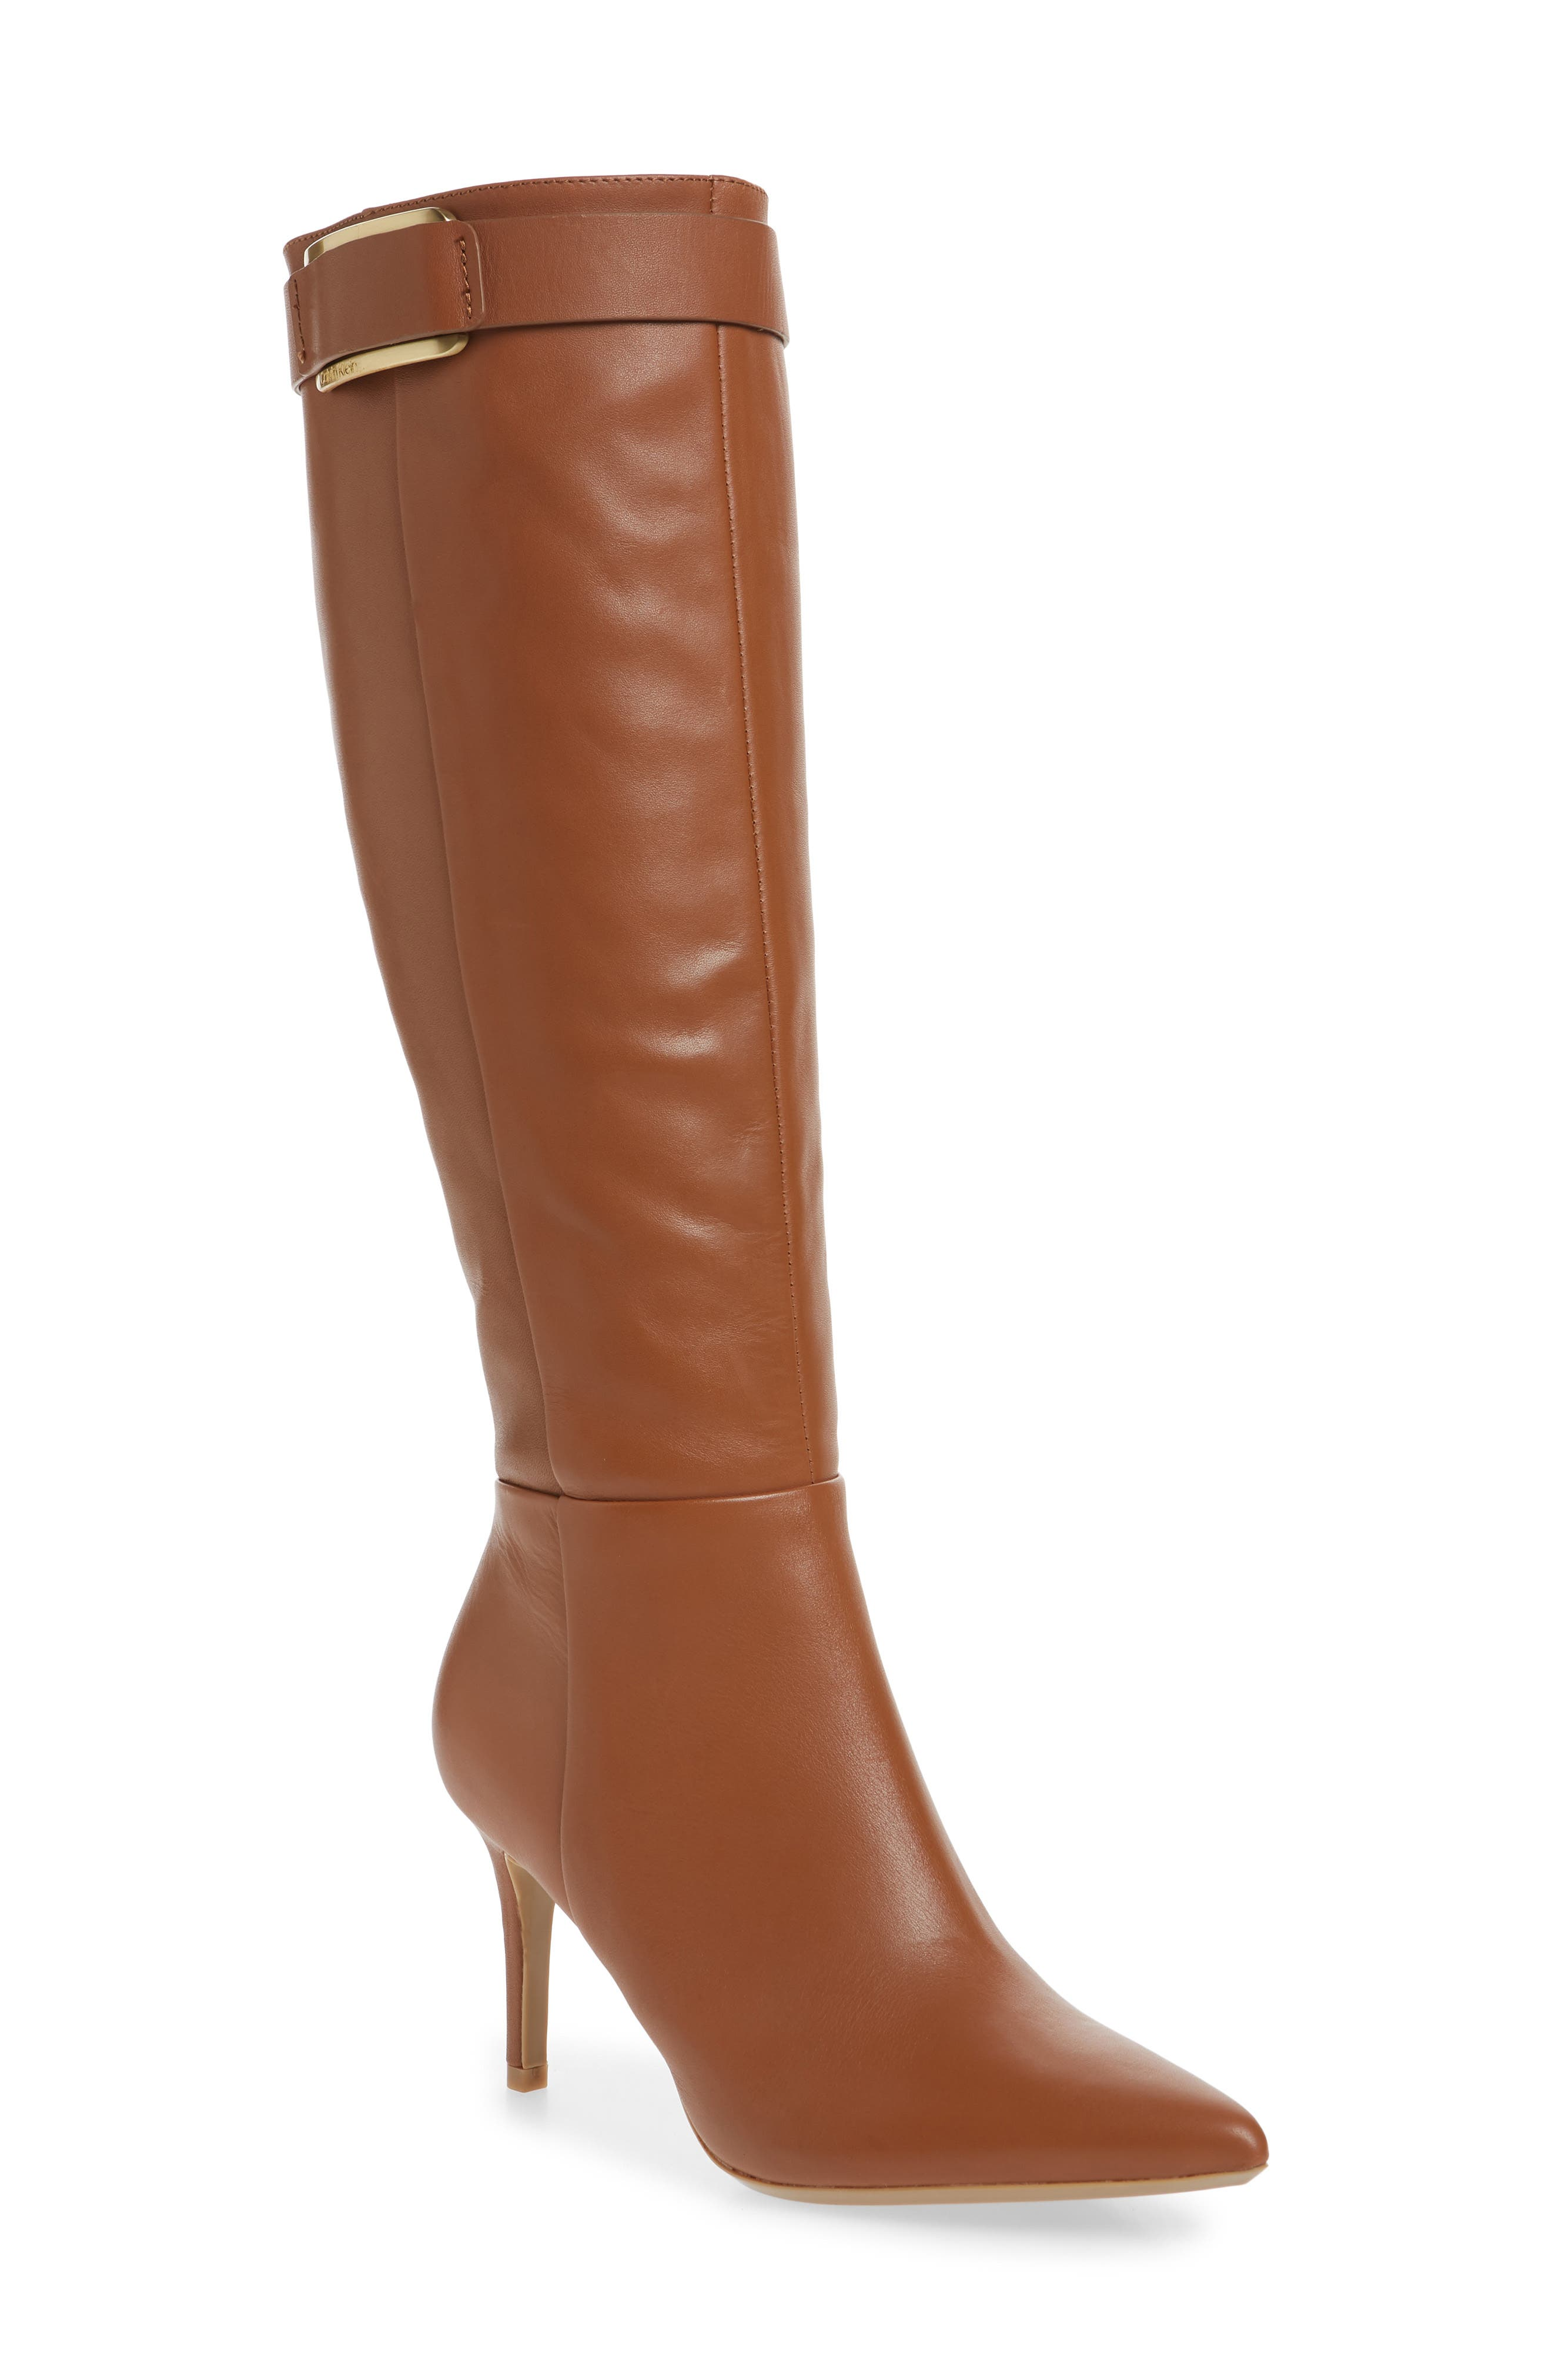 Glydia Stiletto Knee High Boot,                             Main thumbnail 1, color,                             COGNAC LEATHER